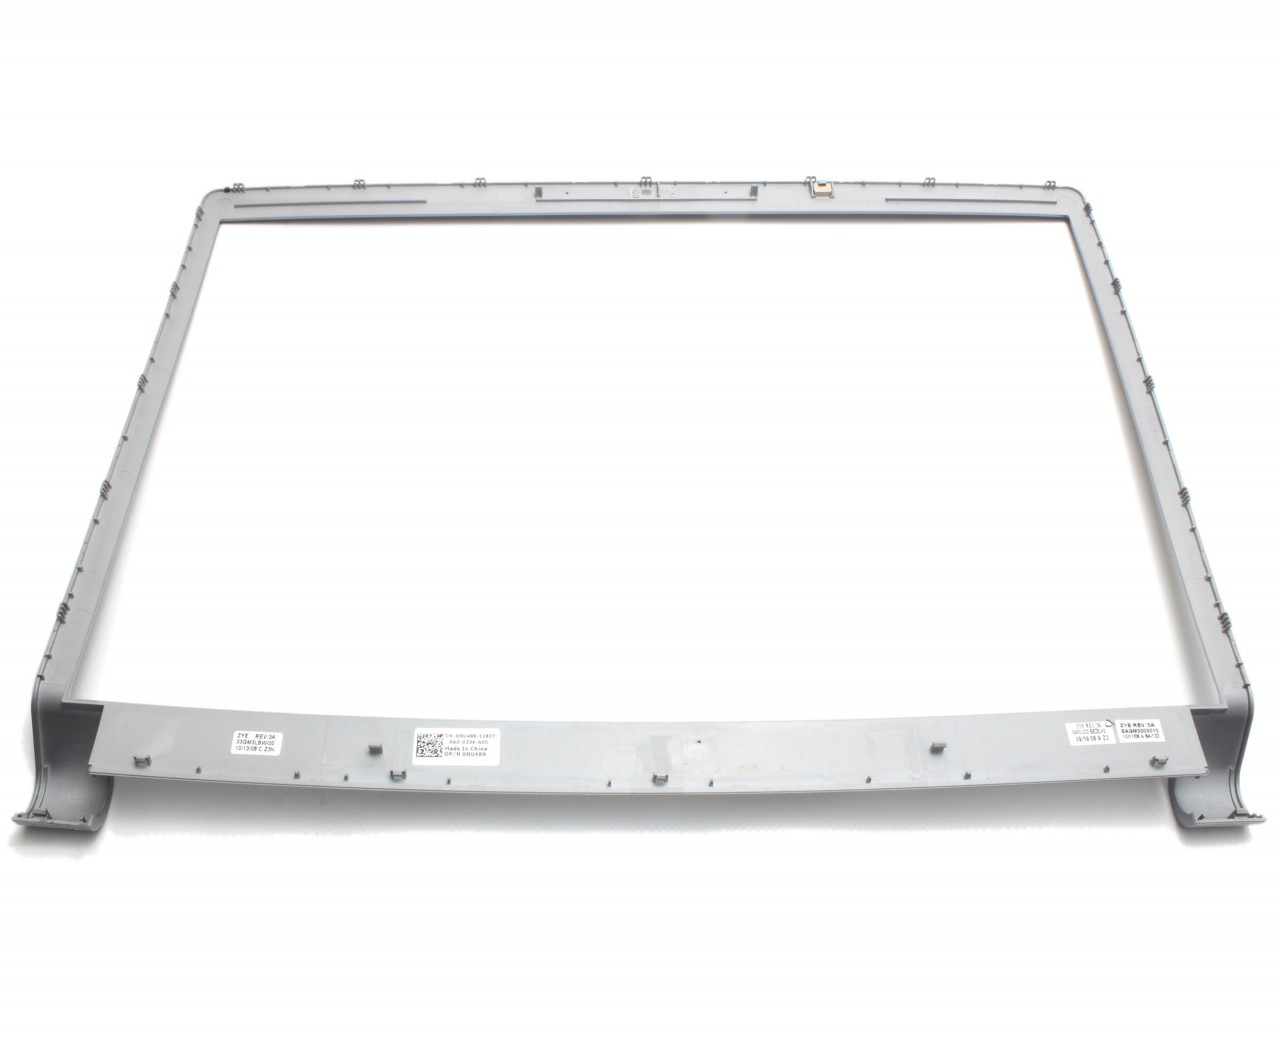 Rama Display Dell EAGM3003010 Bezel Front Cover Argintie imagine powerlaptop.ro 2021